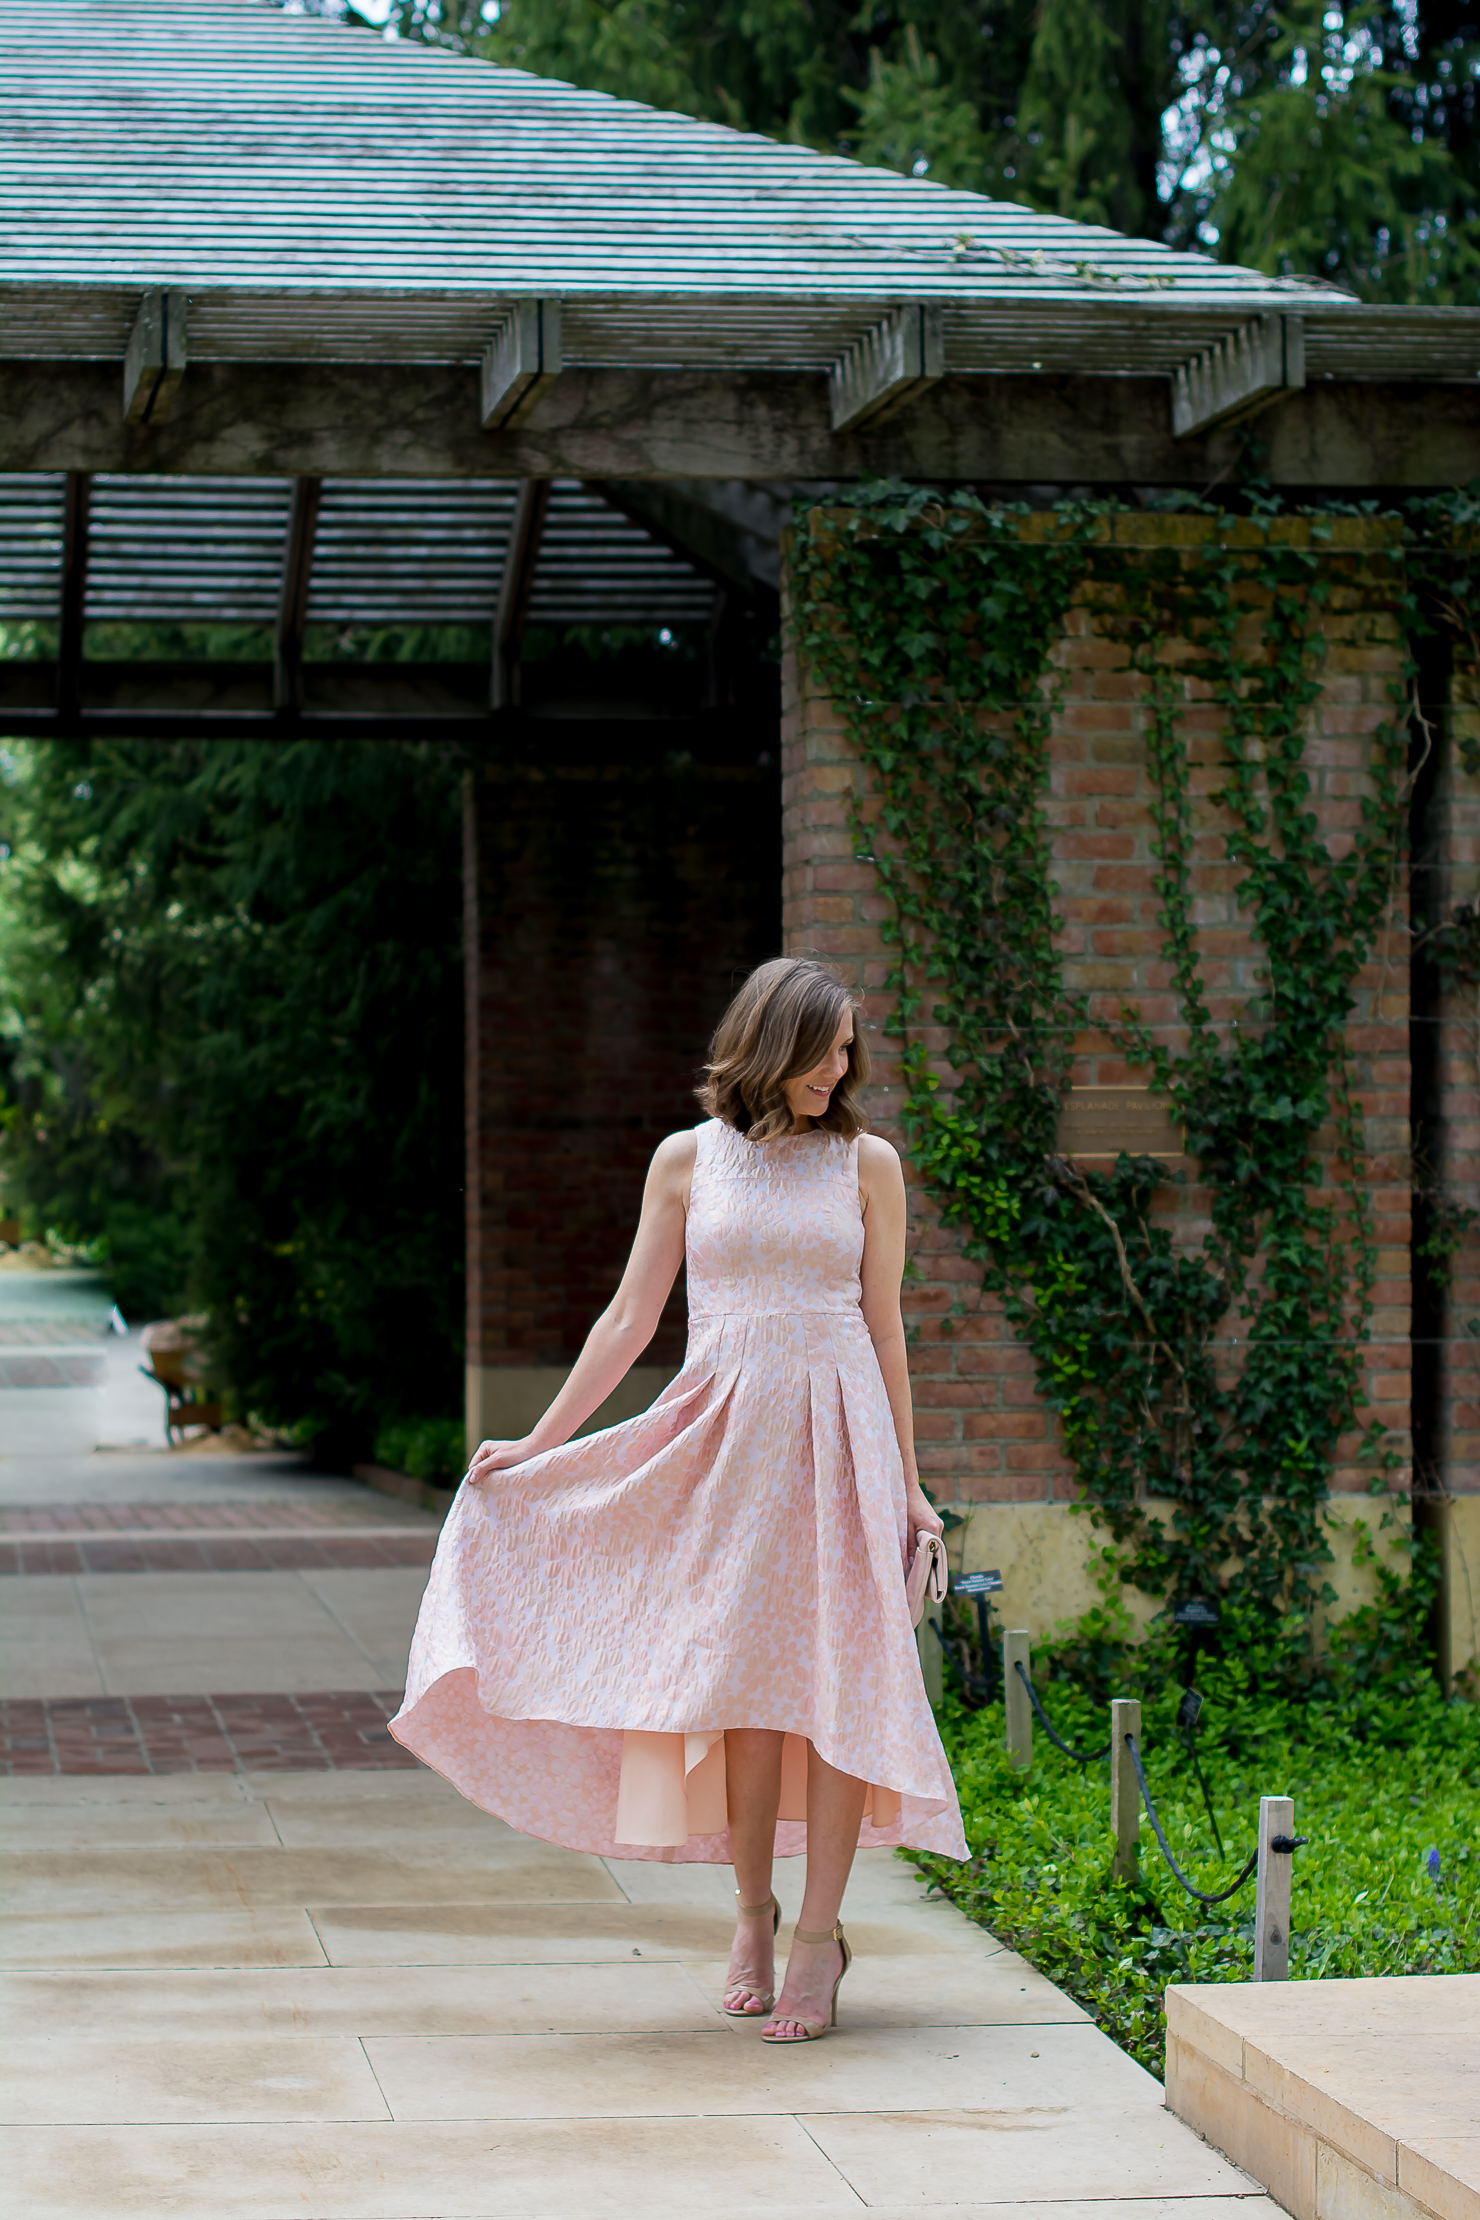 shoshana-coraline-dress-rent-the-runway-blush-folodover-clutch-chicago-botanic-gardens-oscar-de-la-renta-floral-ring